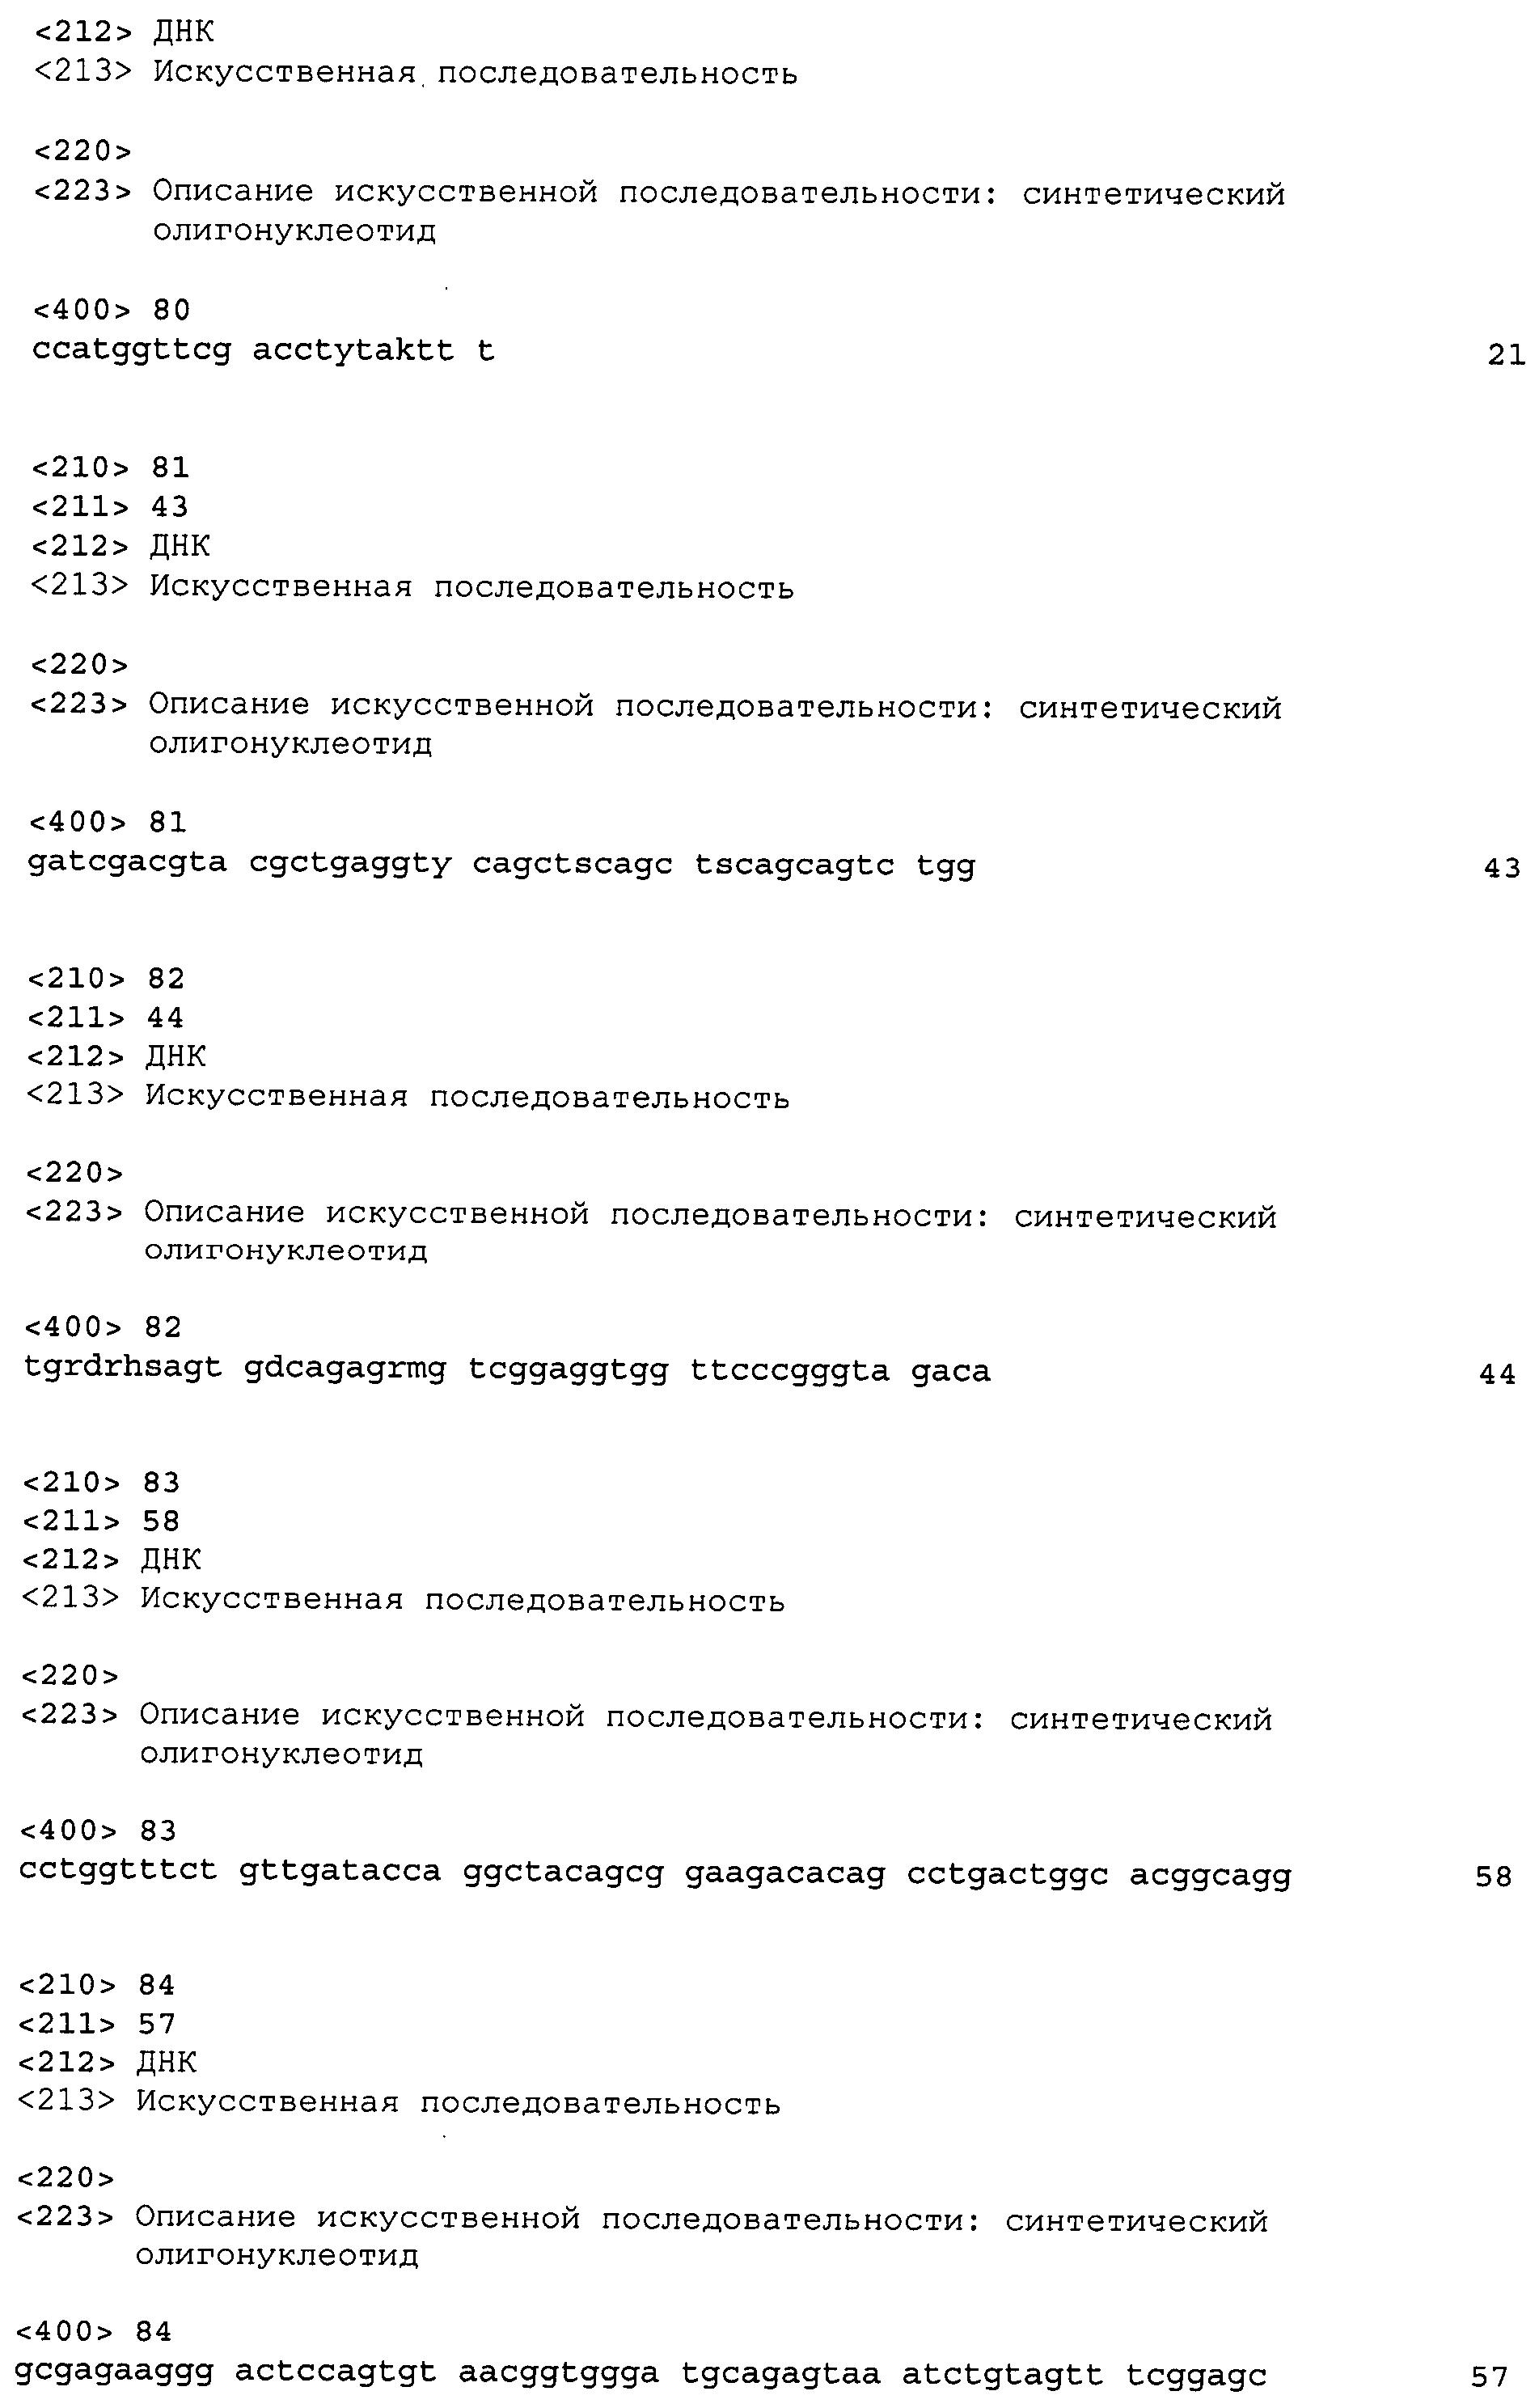 Figure 00000330